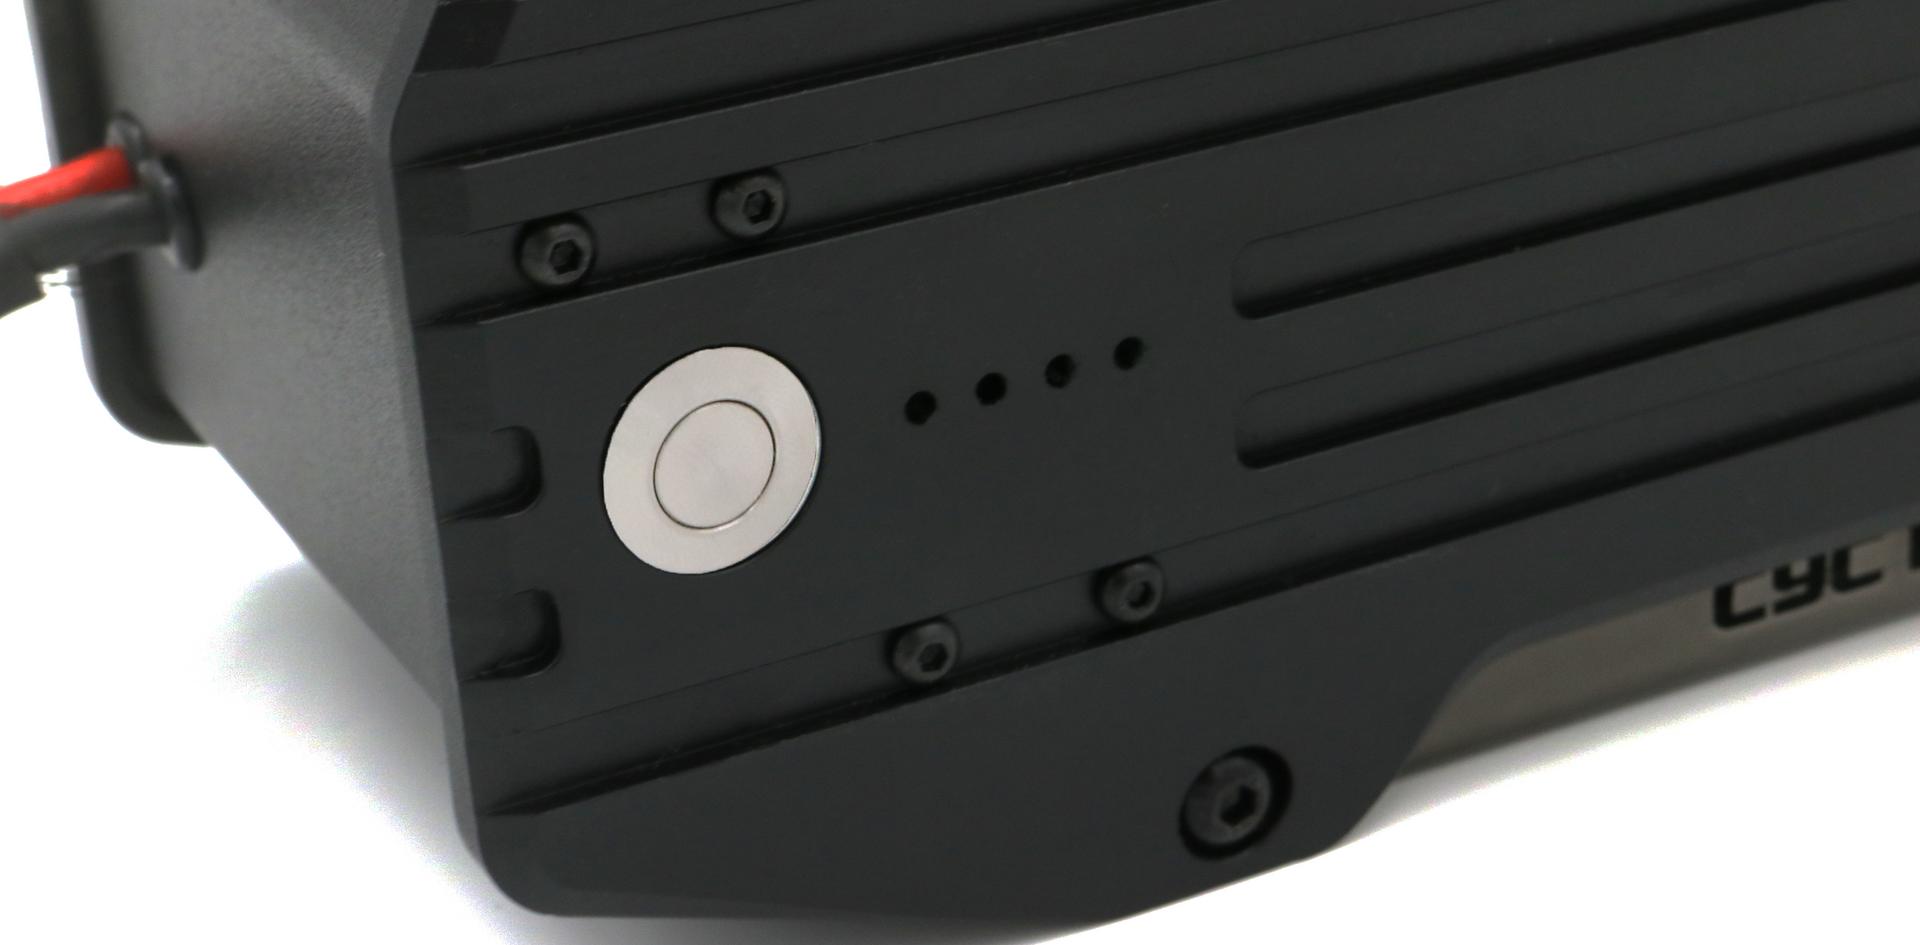 X52 close up of the ebike battery level indicator